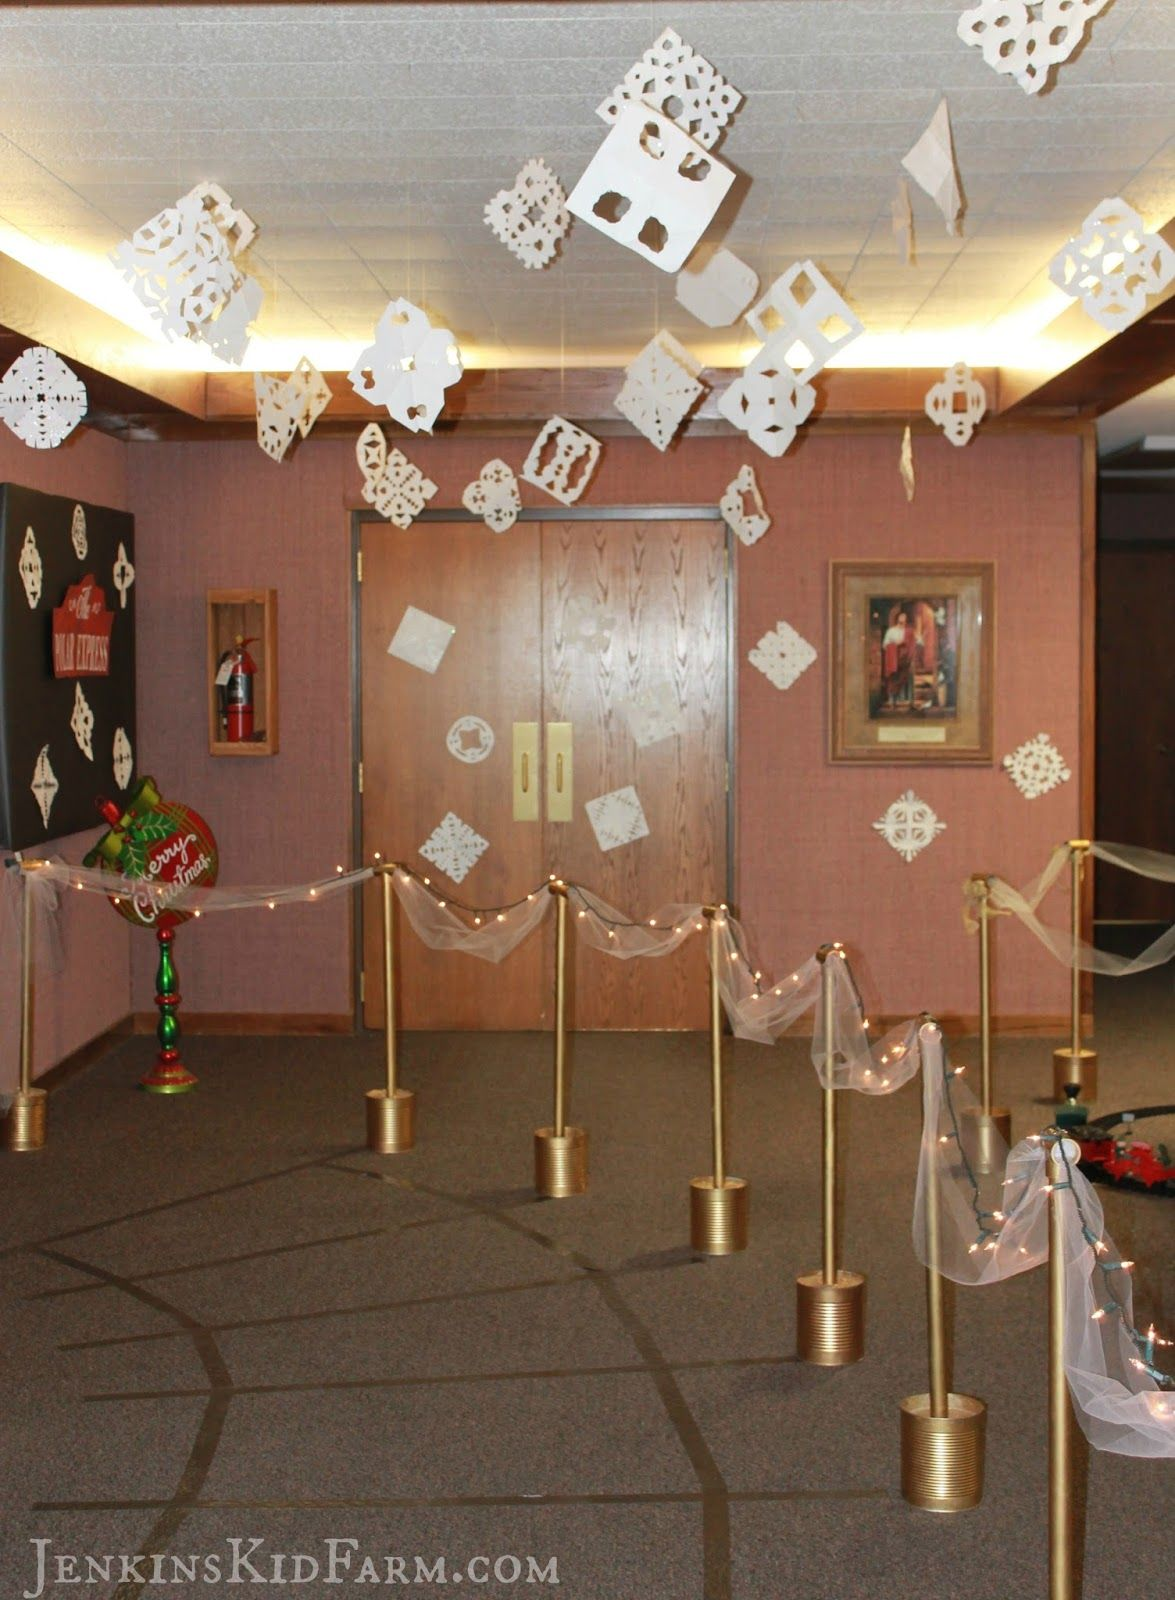 Ward Christmas Party Ideas Part - 38: Jenkins Kid Farm: Polar Express Ward Christmas Party